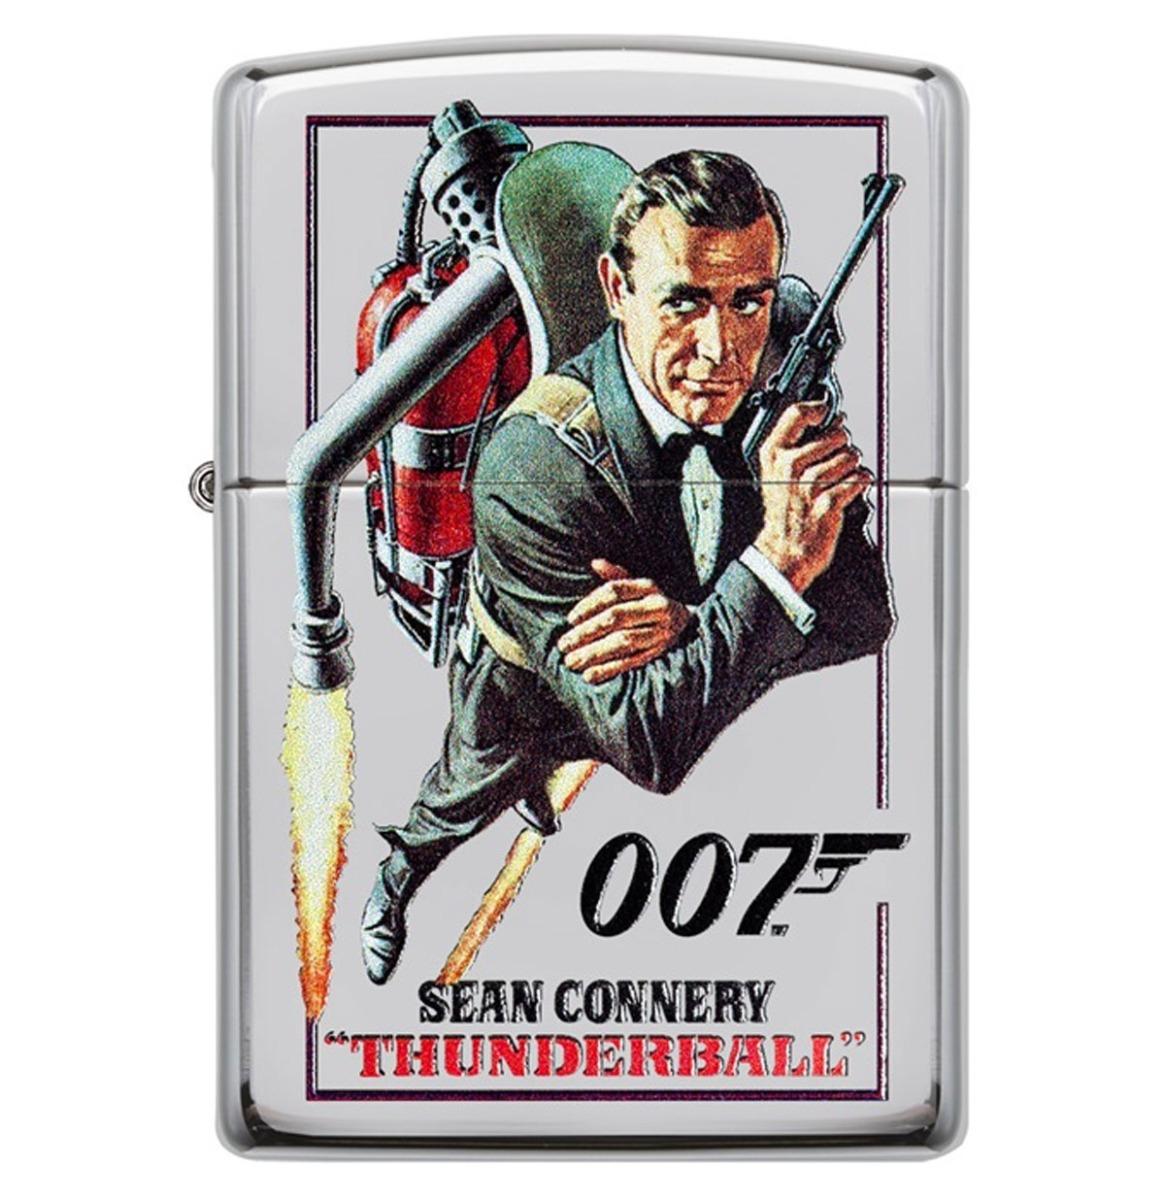 fiftiesstore Zippo Aansteker James Bond 007 Sean Connery